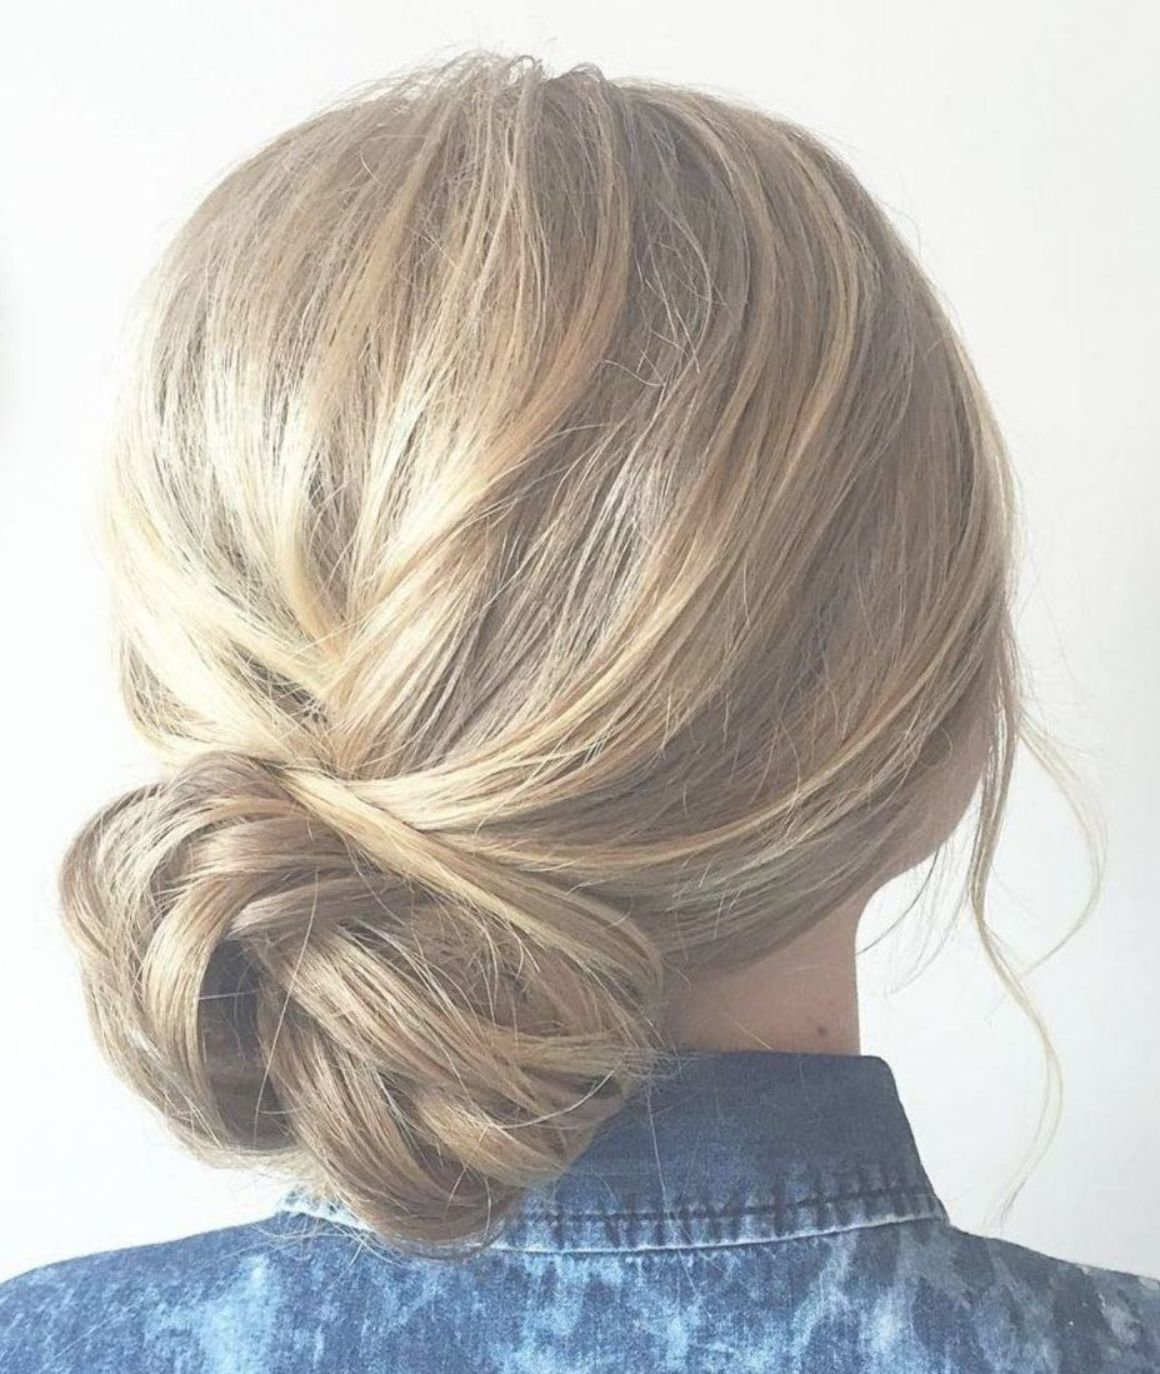 10 Low Side Bun For Thin Hair Thin Hair Updo Side Bun Hairstyles Side Bun Updo